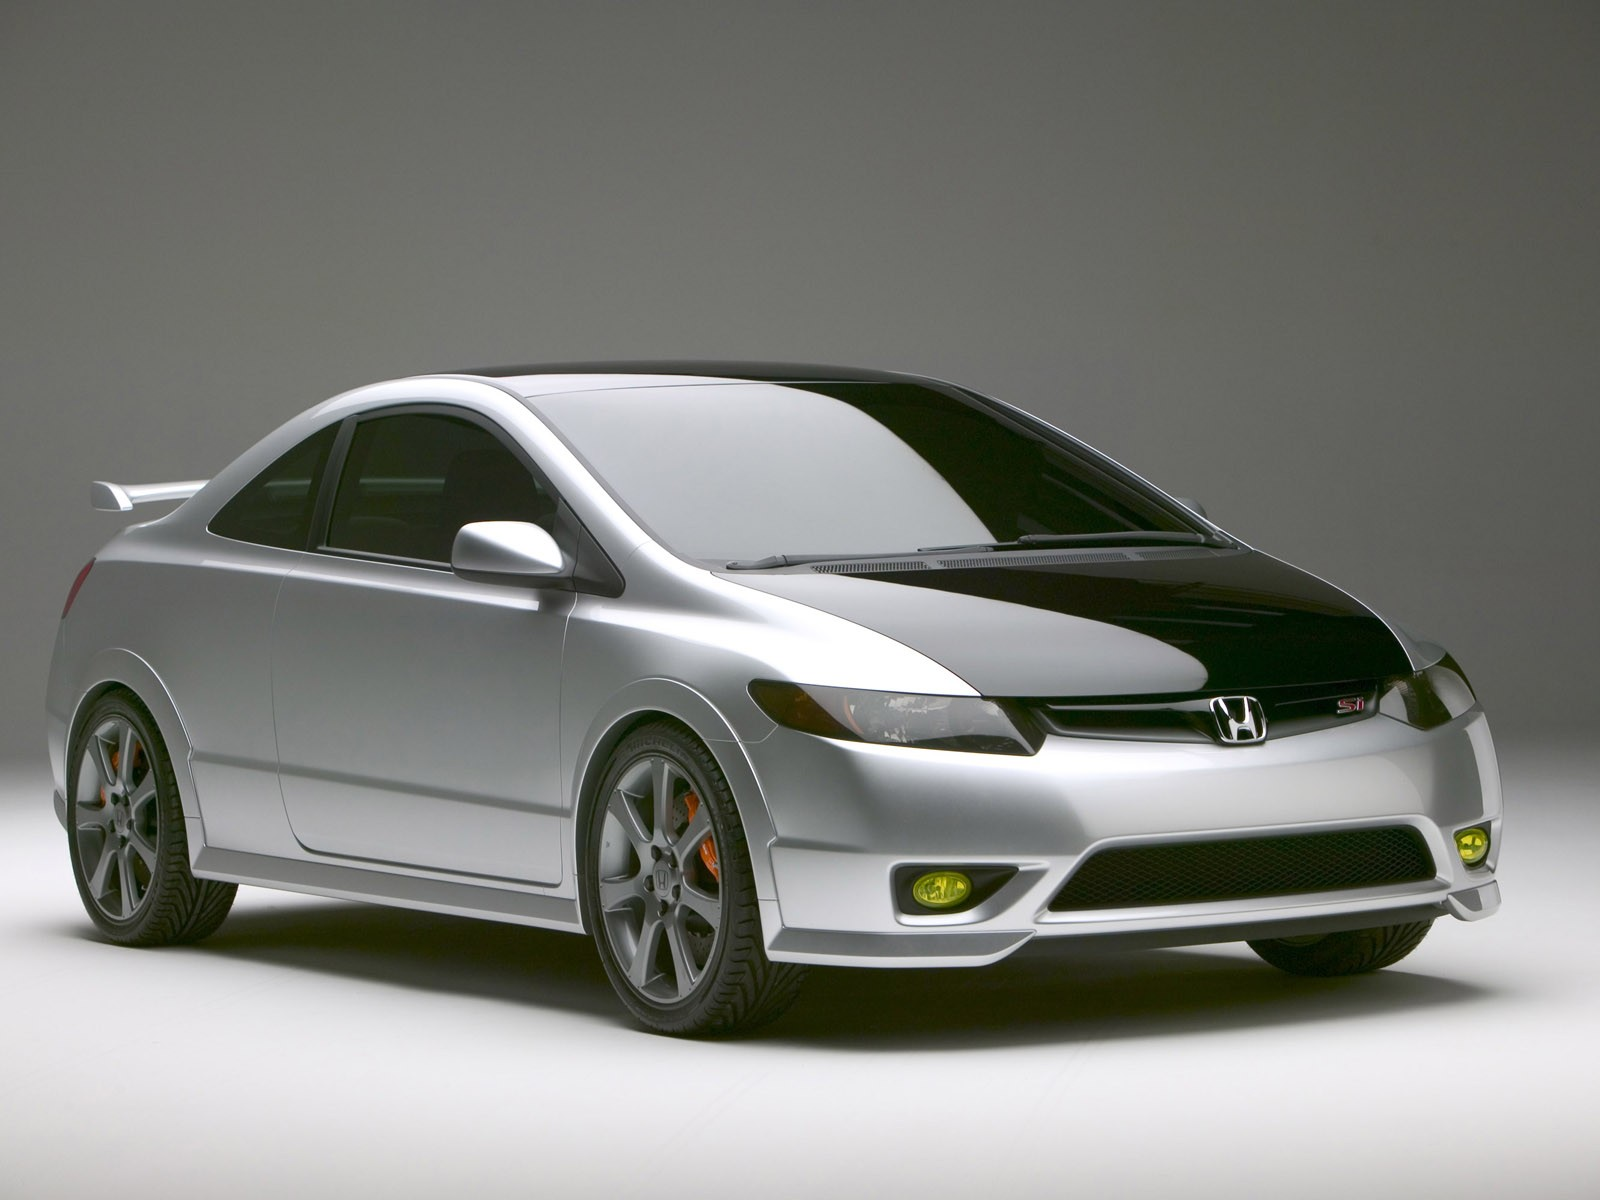 Bmw I8 Concept Honda Civic Si